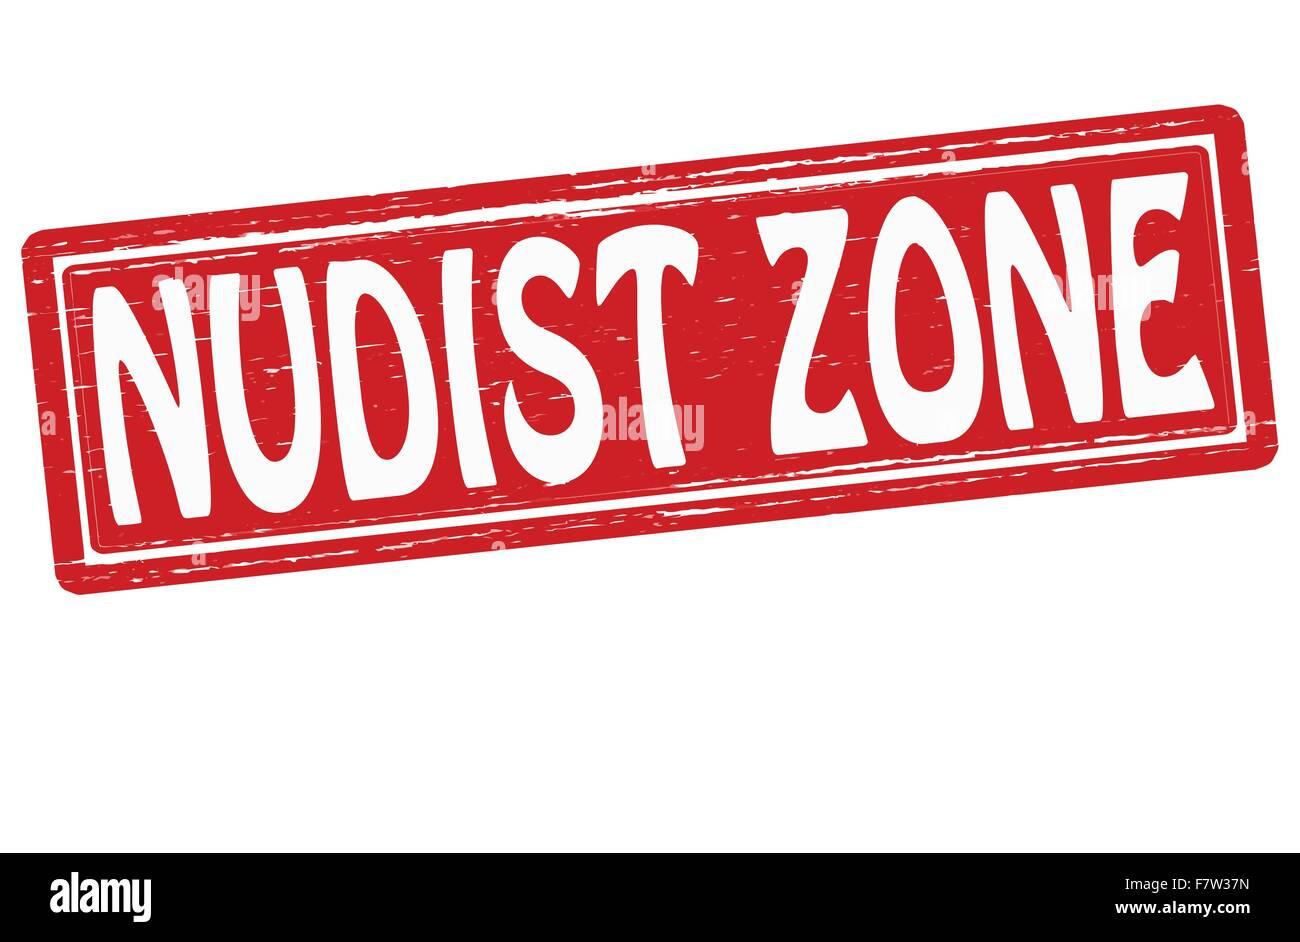 Nudist Zone Nudist zone